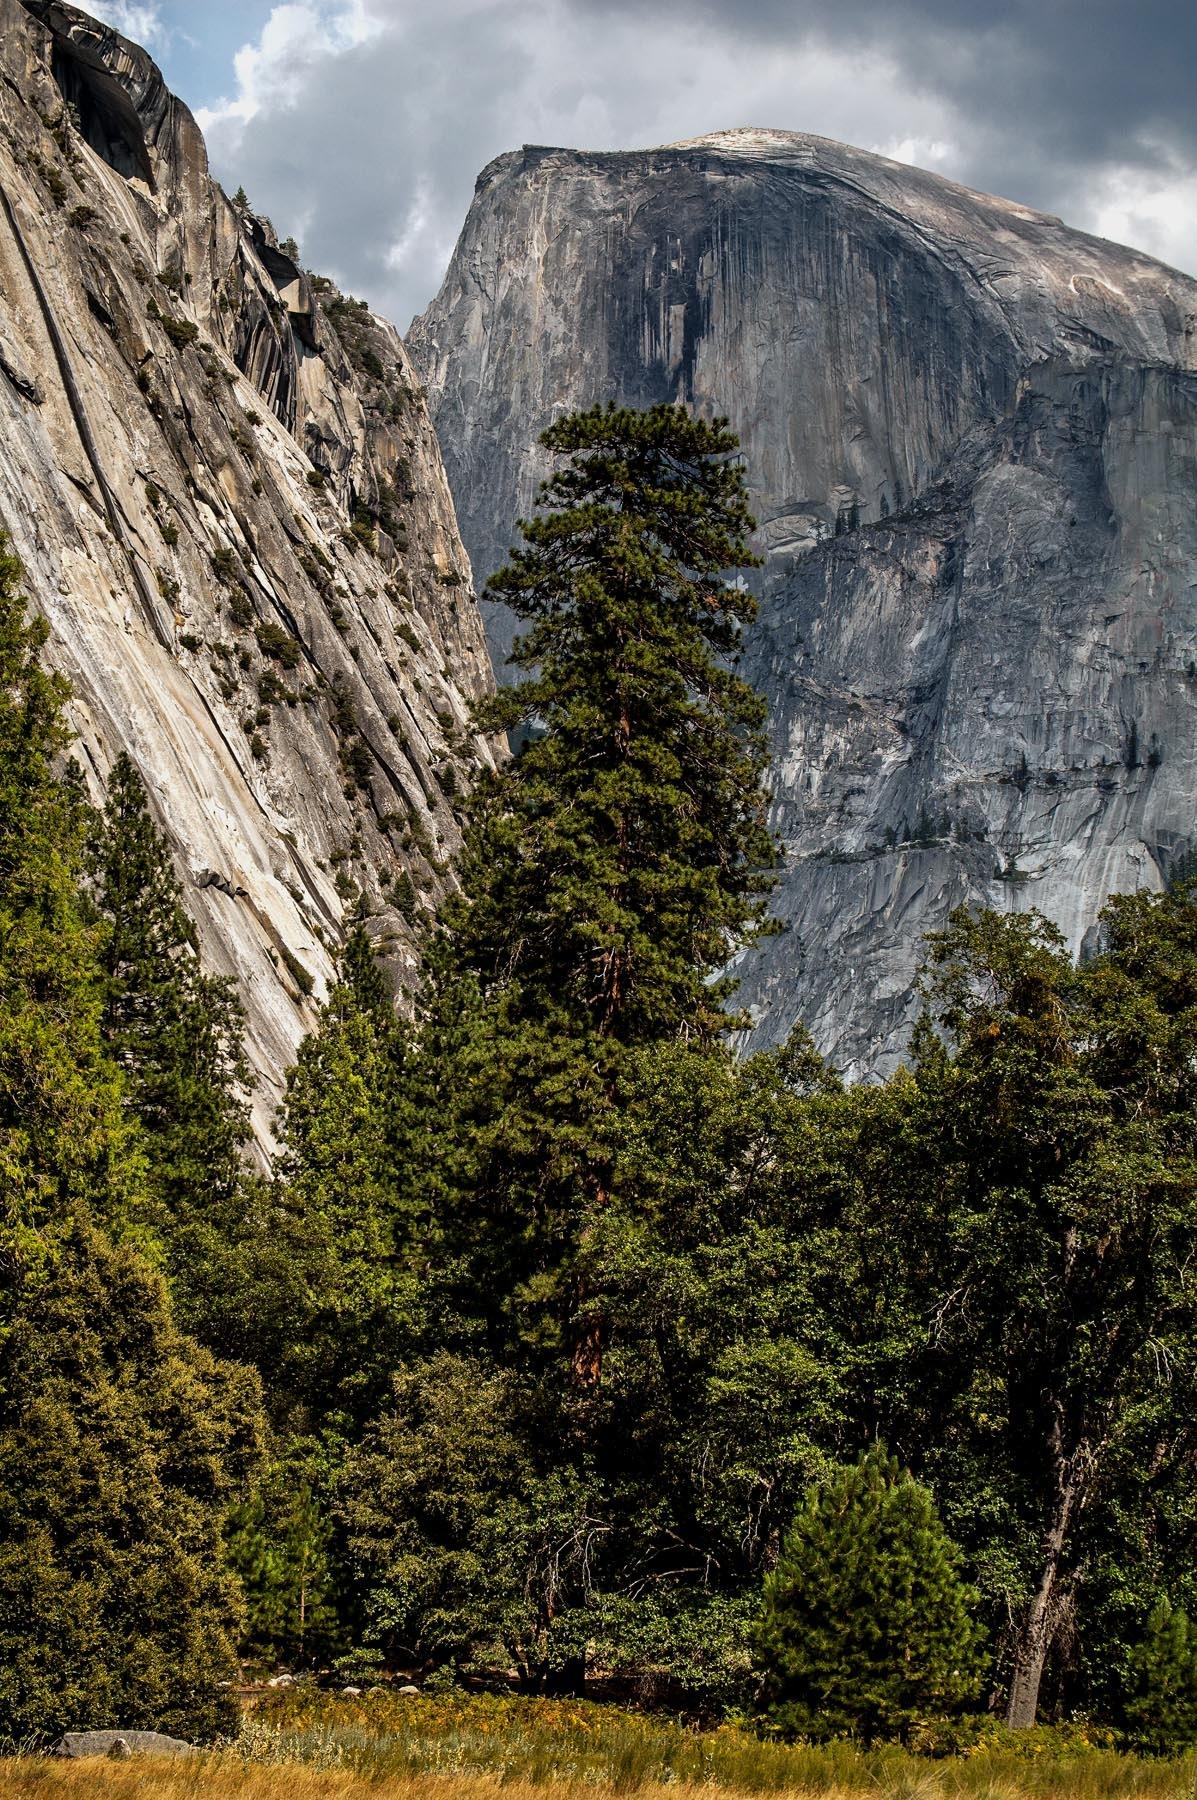 The Half Dome - Yosemite Valley Perspective by revpaulvet